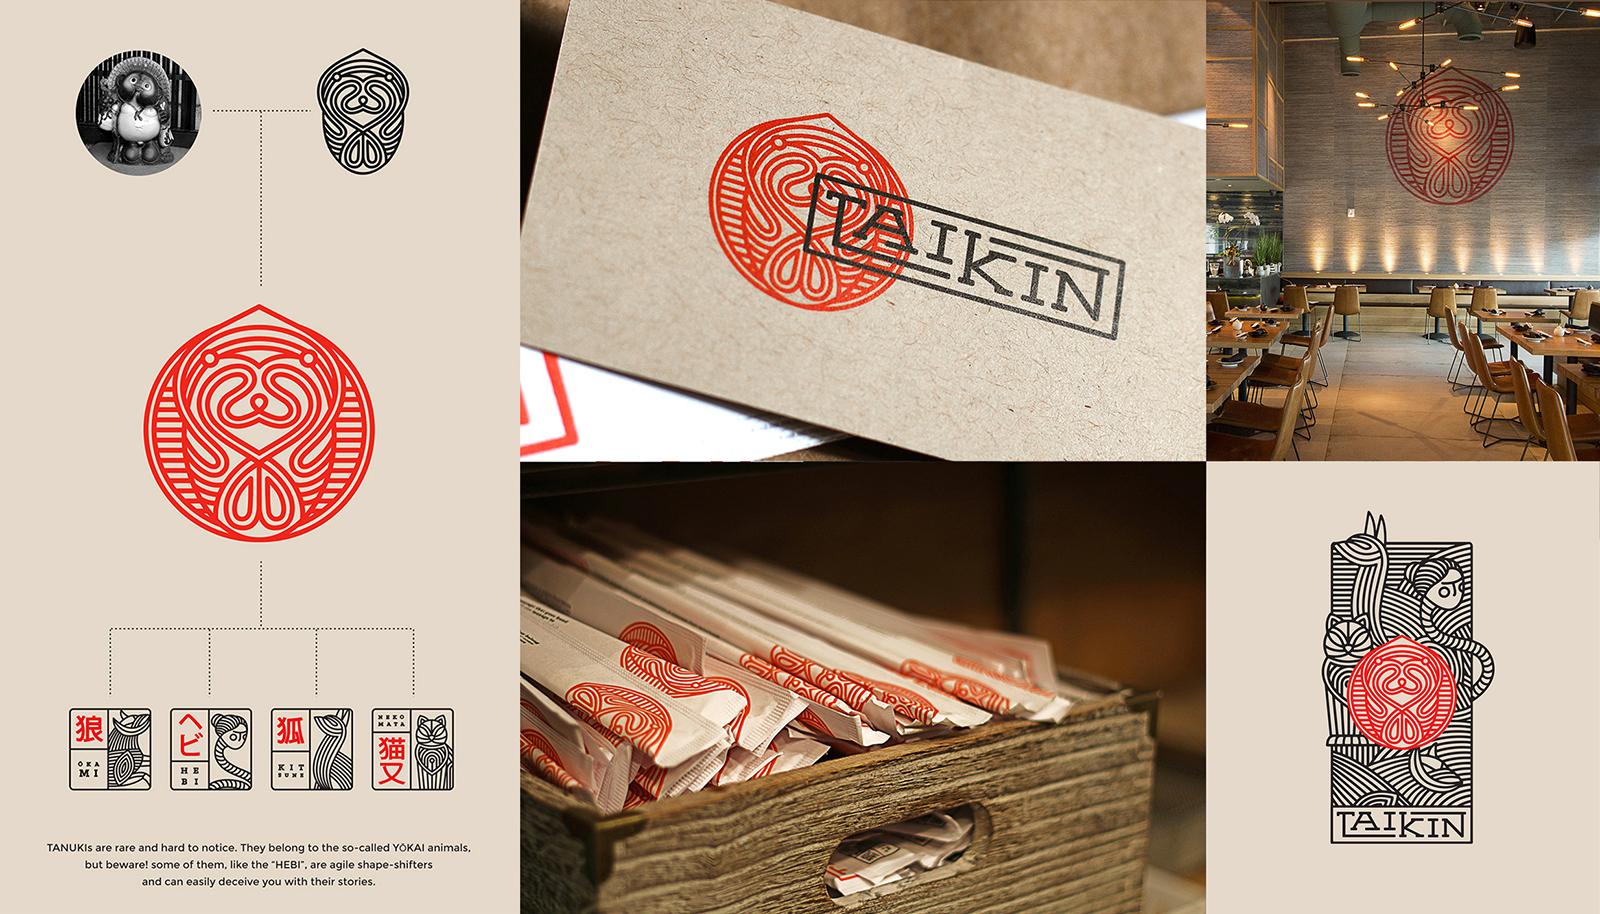 Friday Likes 271 & Taikin两款品牌包装设计欣赏-深圳VI设计3